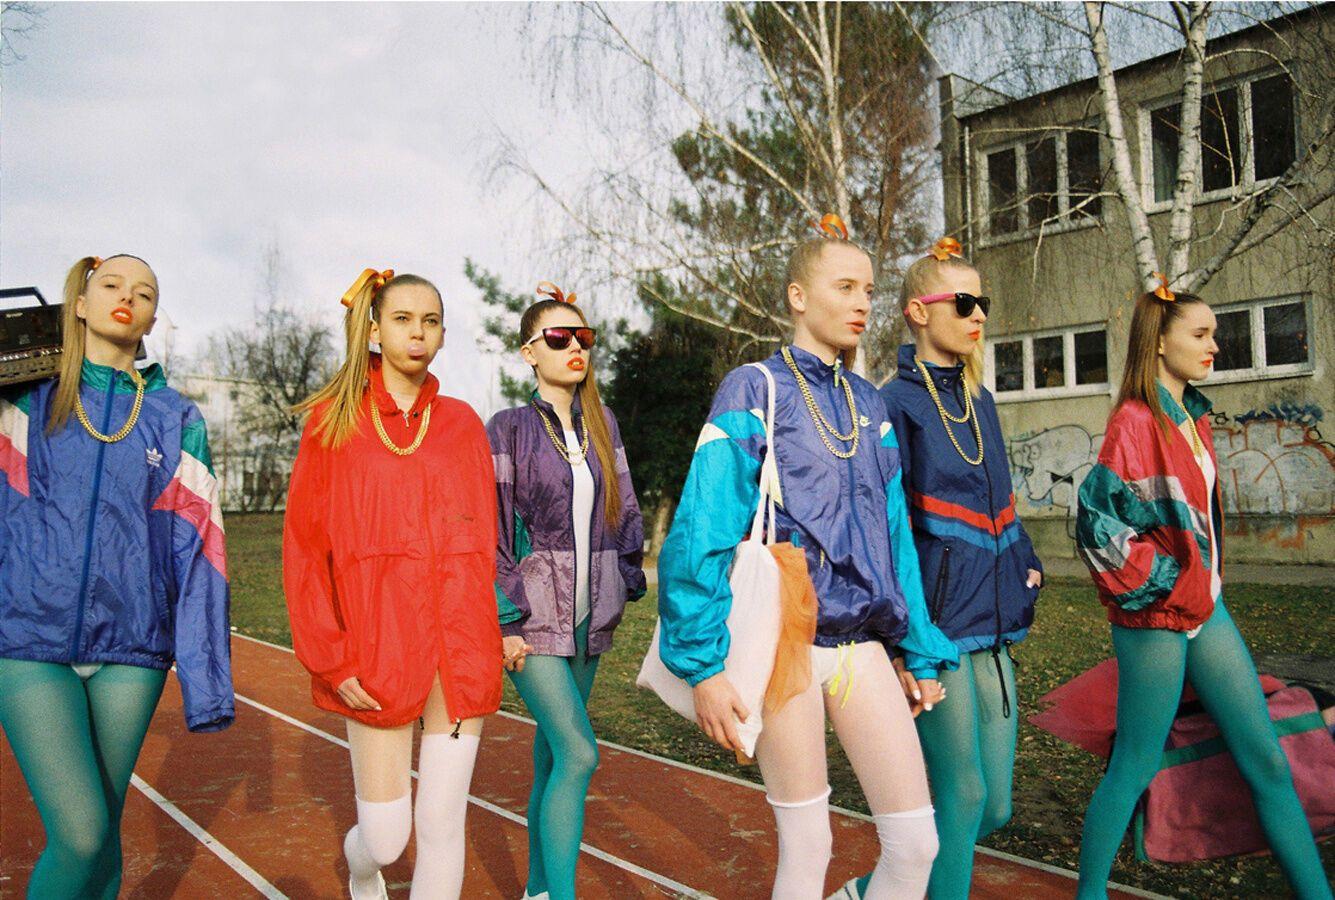 Від Пугачової до Depeche Mode: яка музика грала на дискотеках в СРСР